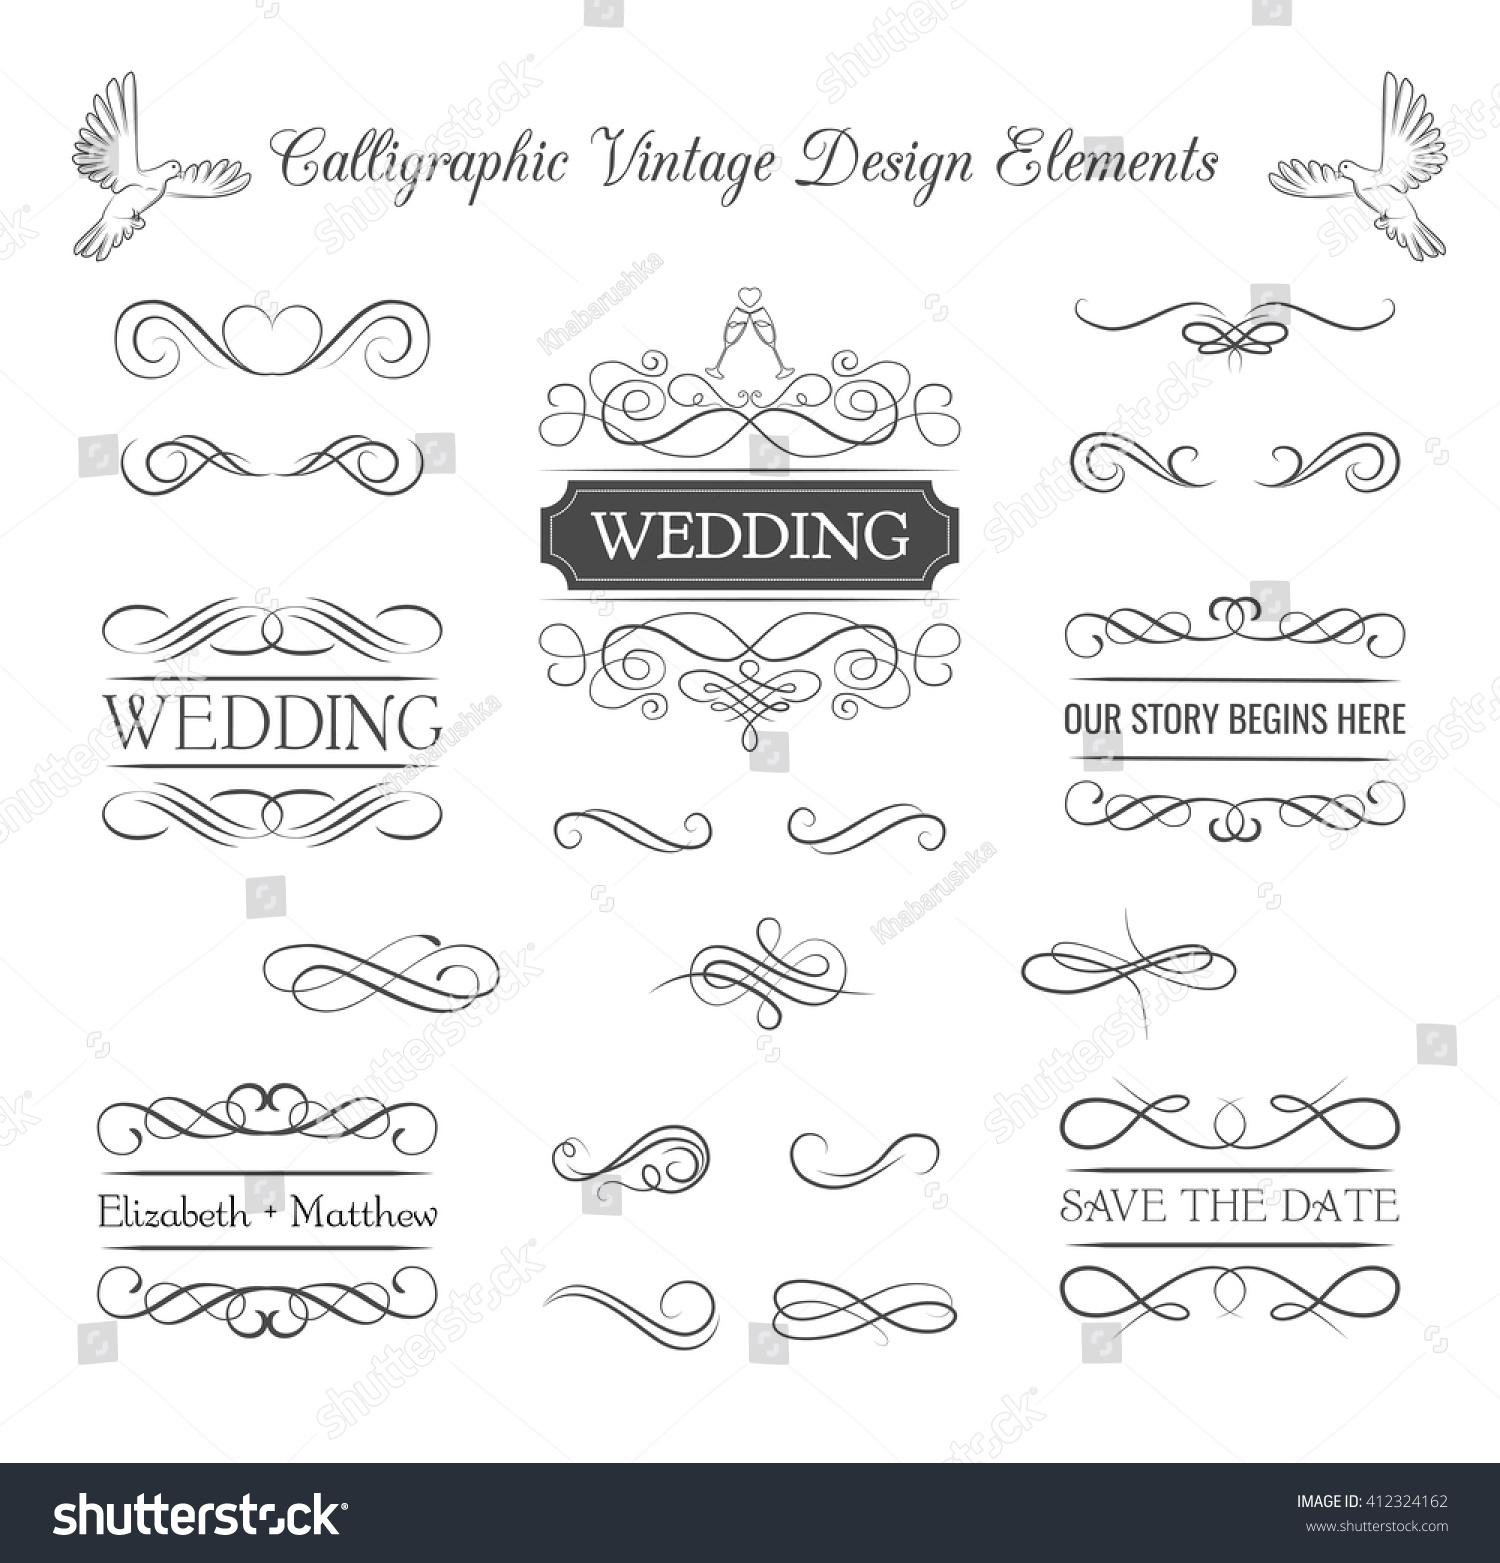 Decorative Wedding Invitation Badge 7: Wedding Ornaments Decorative Elements Vintage Ribbon Stock